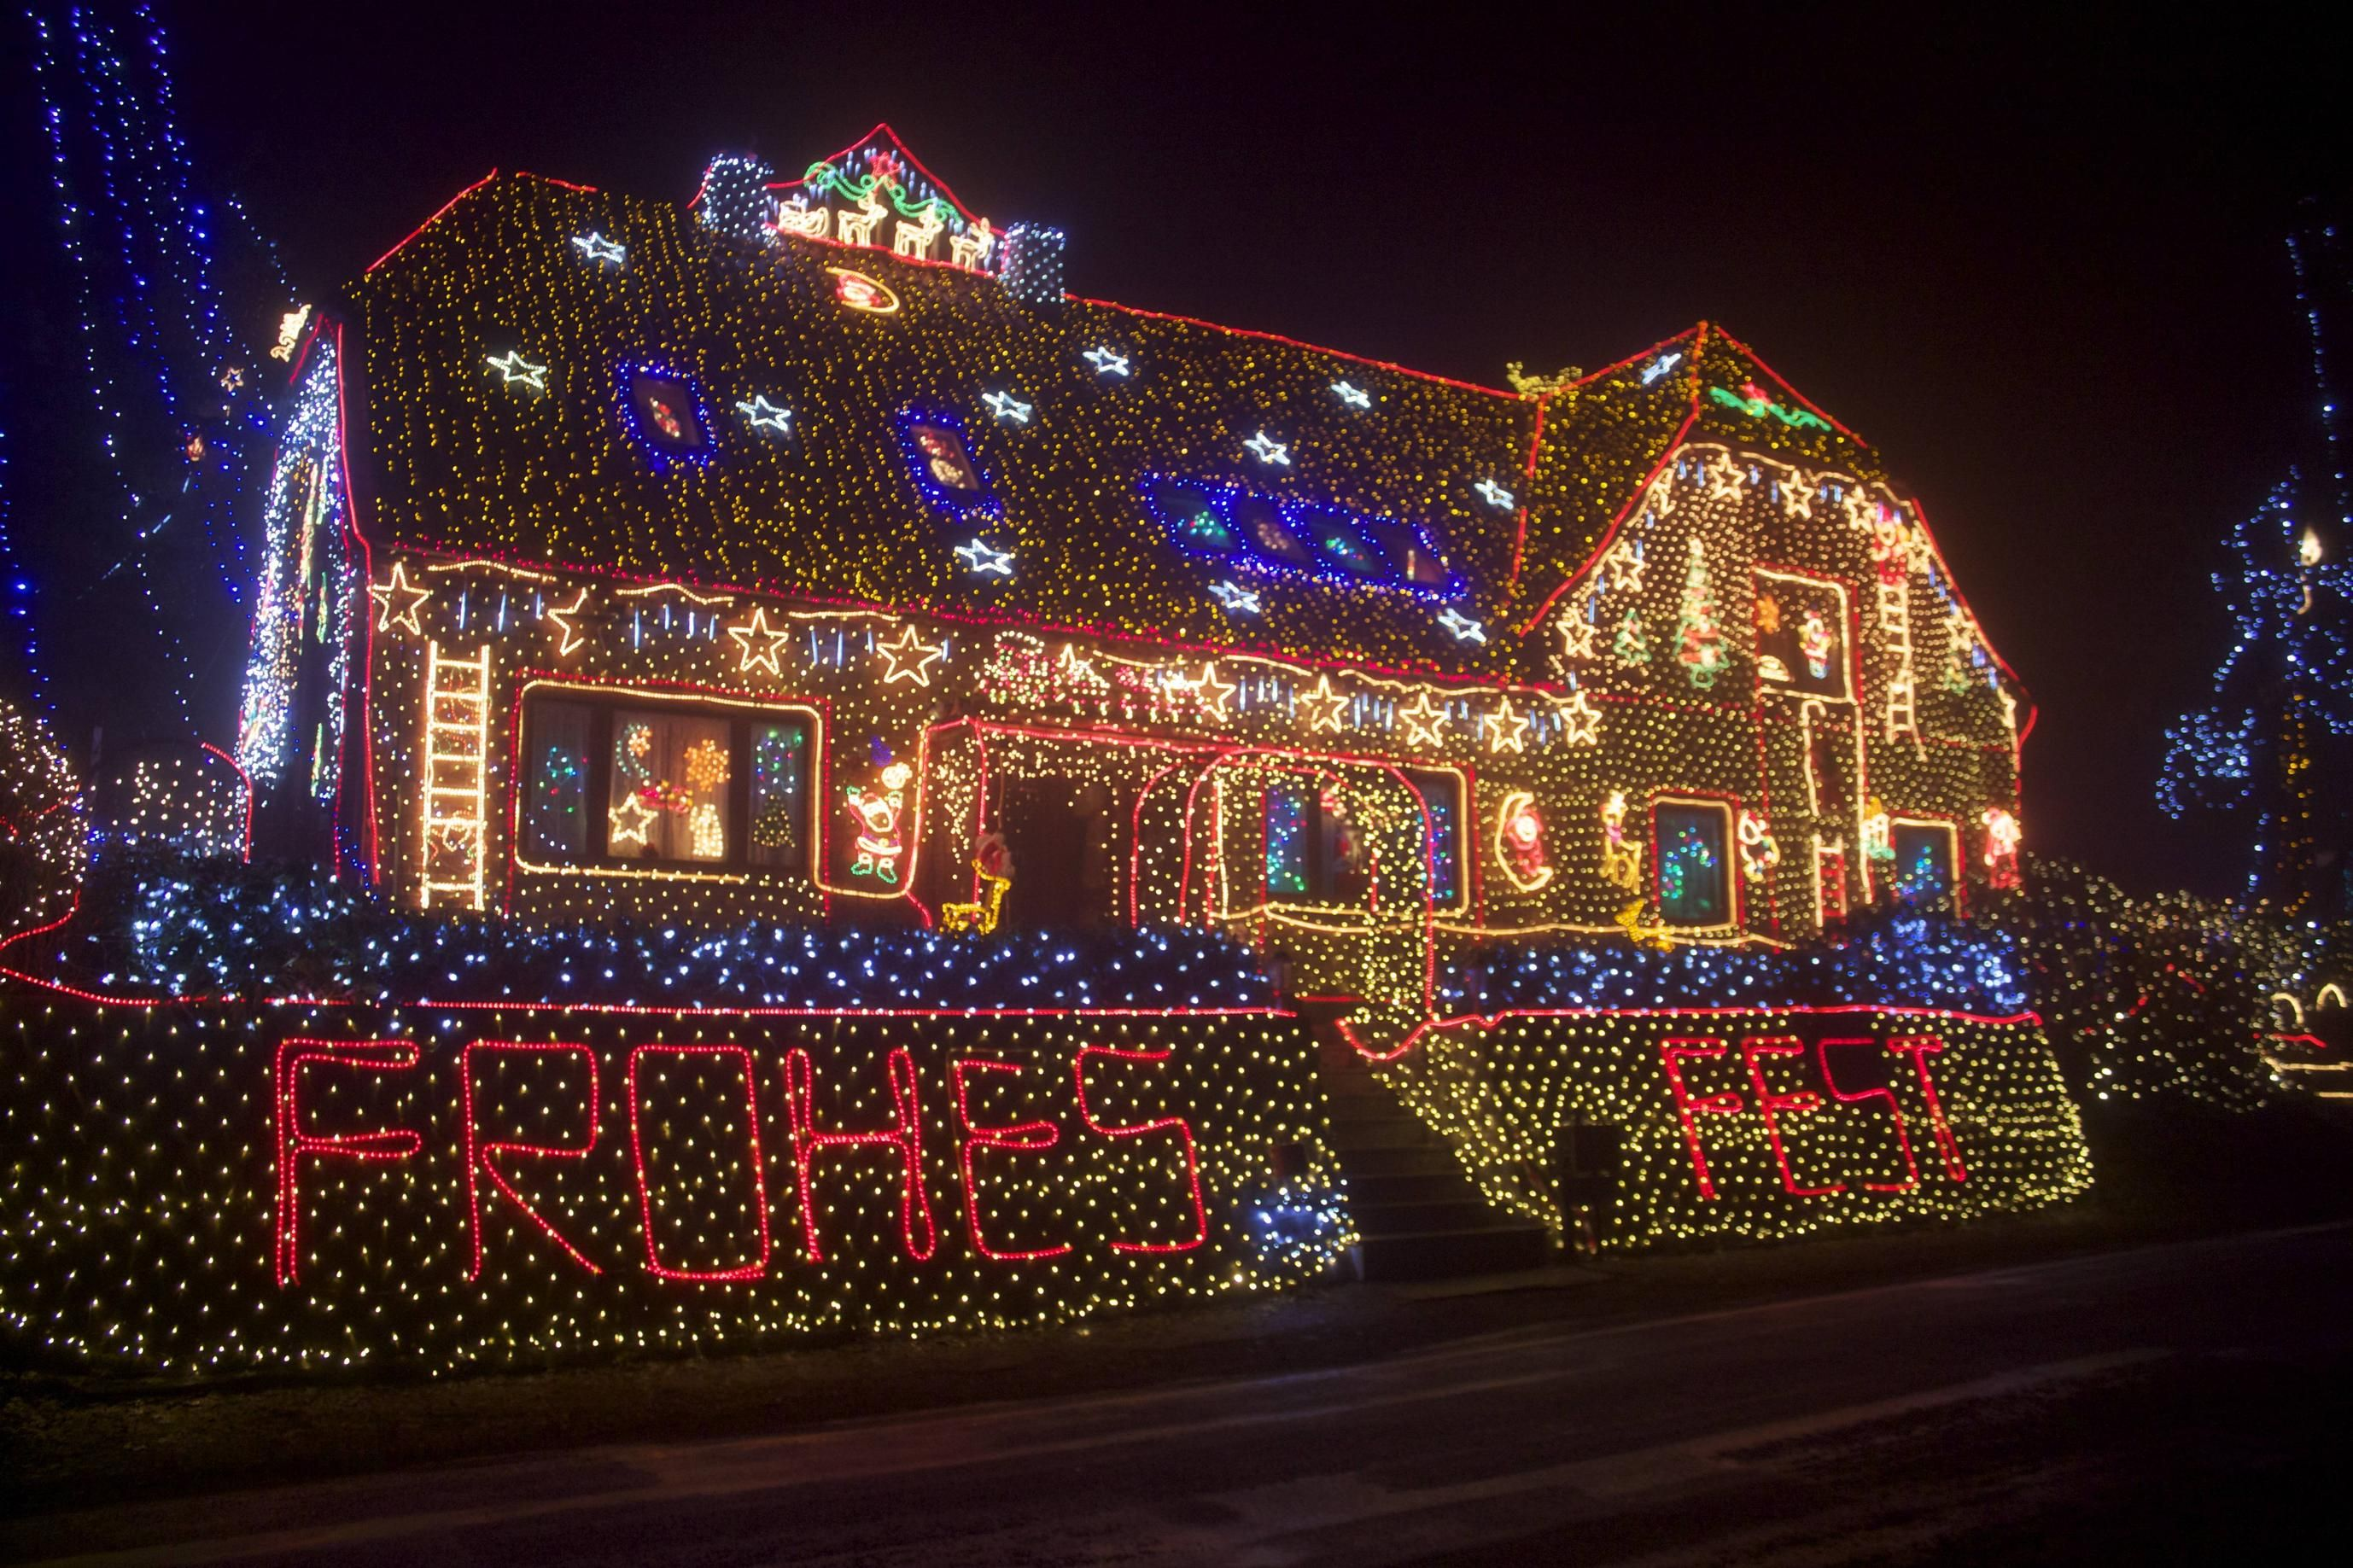 Best Xmas Lights Ever Europe Album On Imgur Christmas Lights Best Christmas Lights Led Christmas Lights